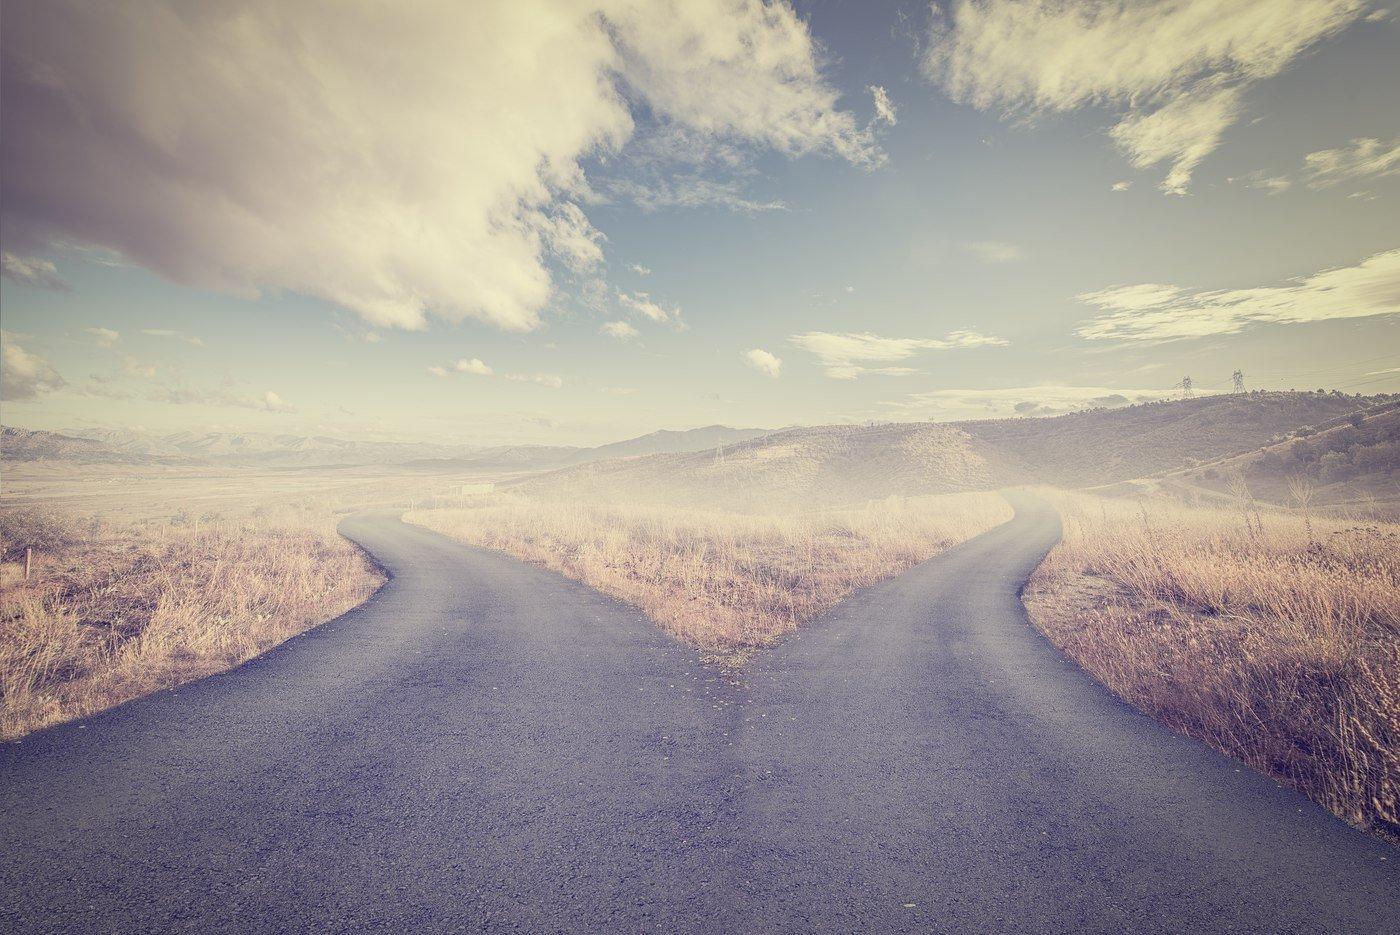 My Journey to Motherhood - Part I: My Choice